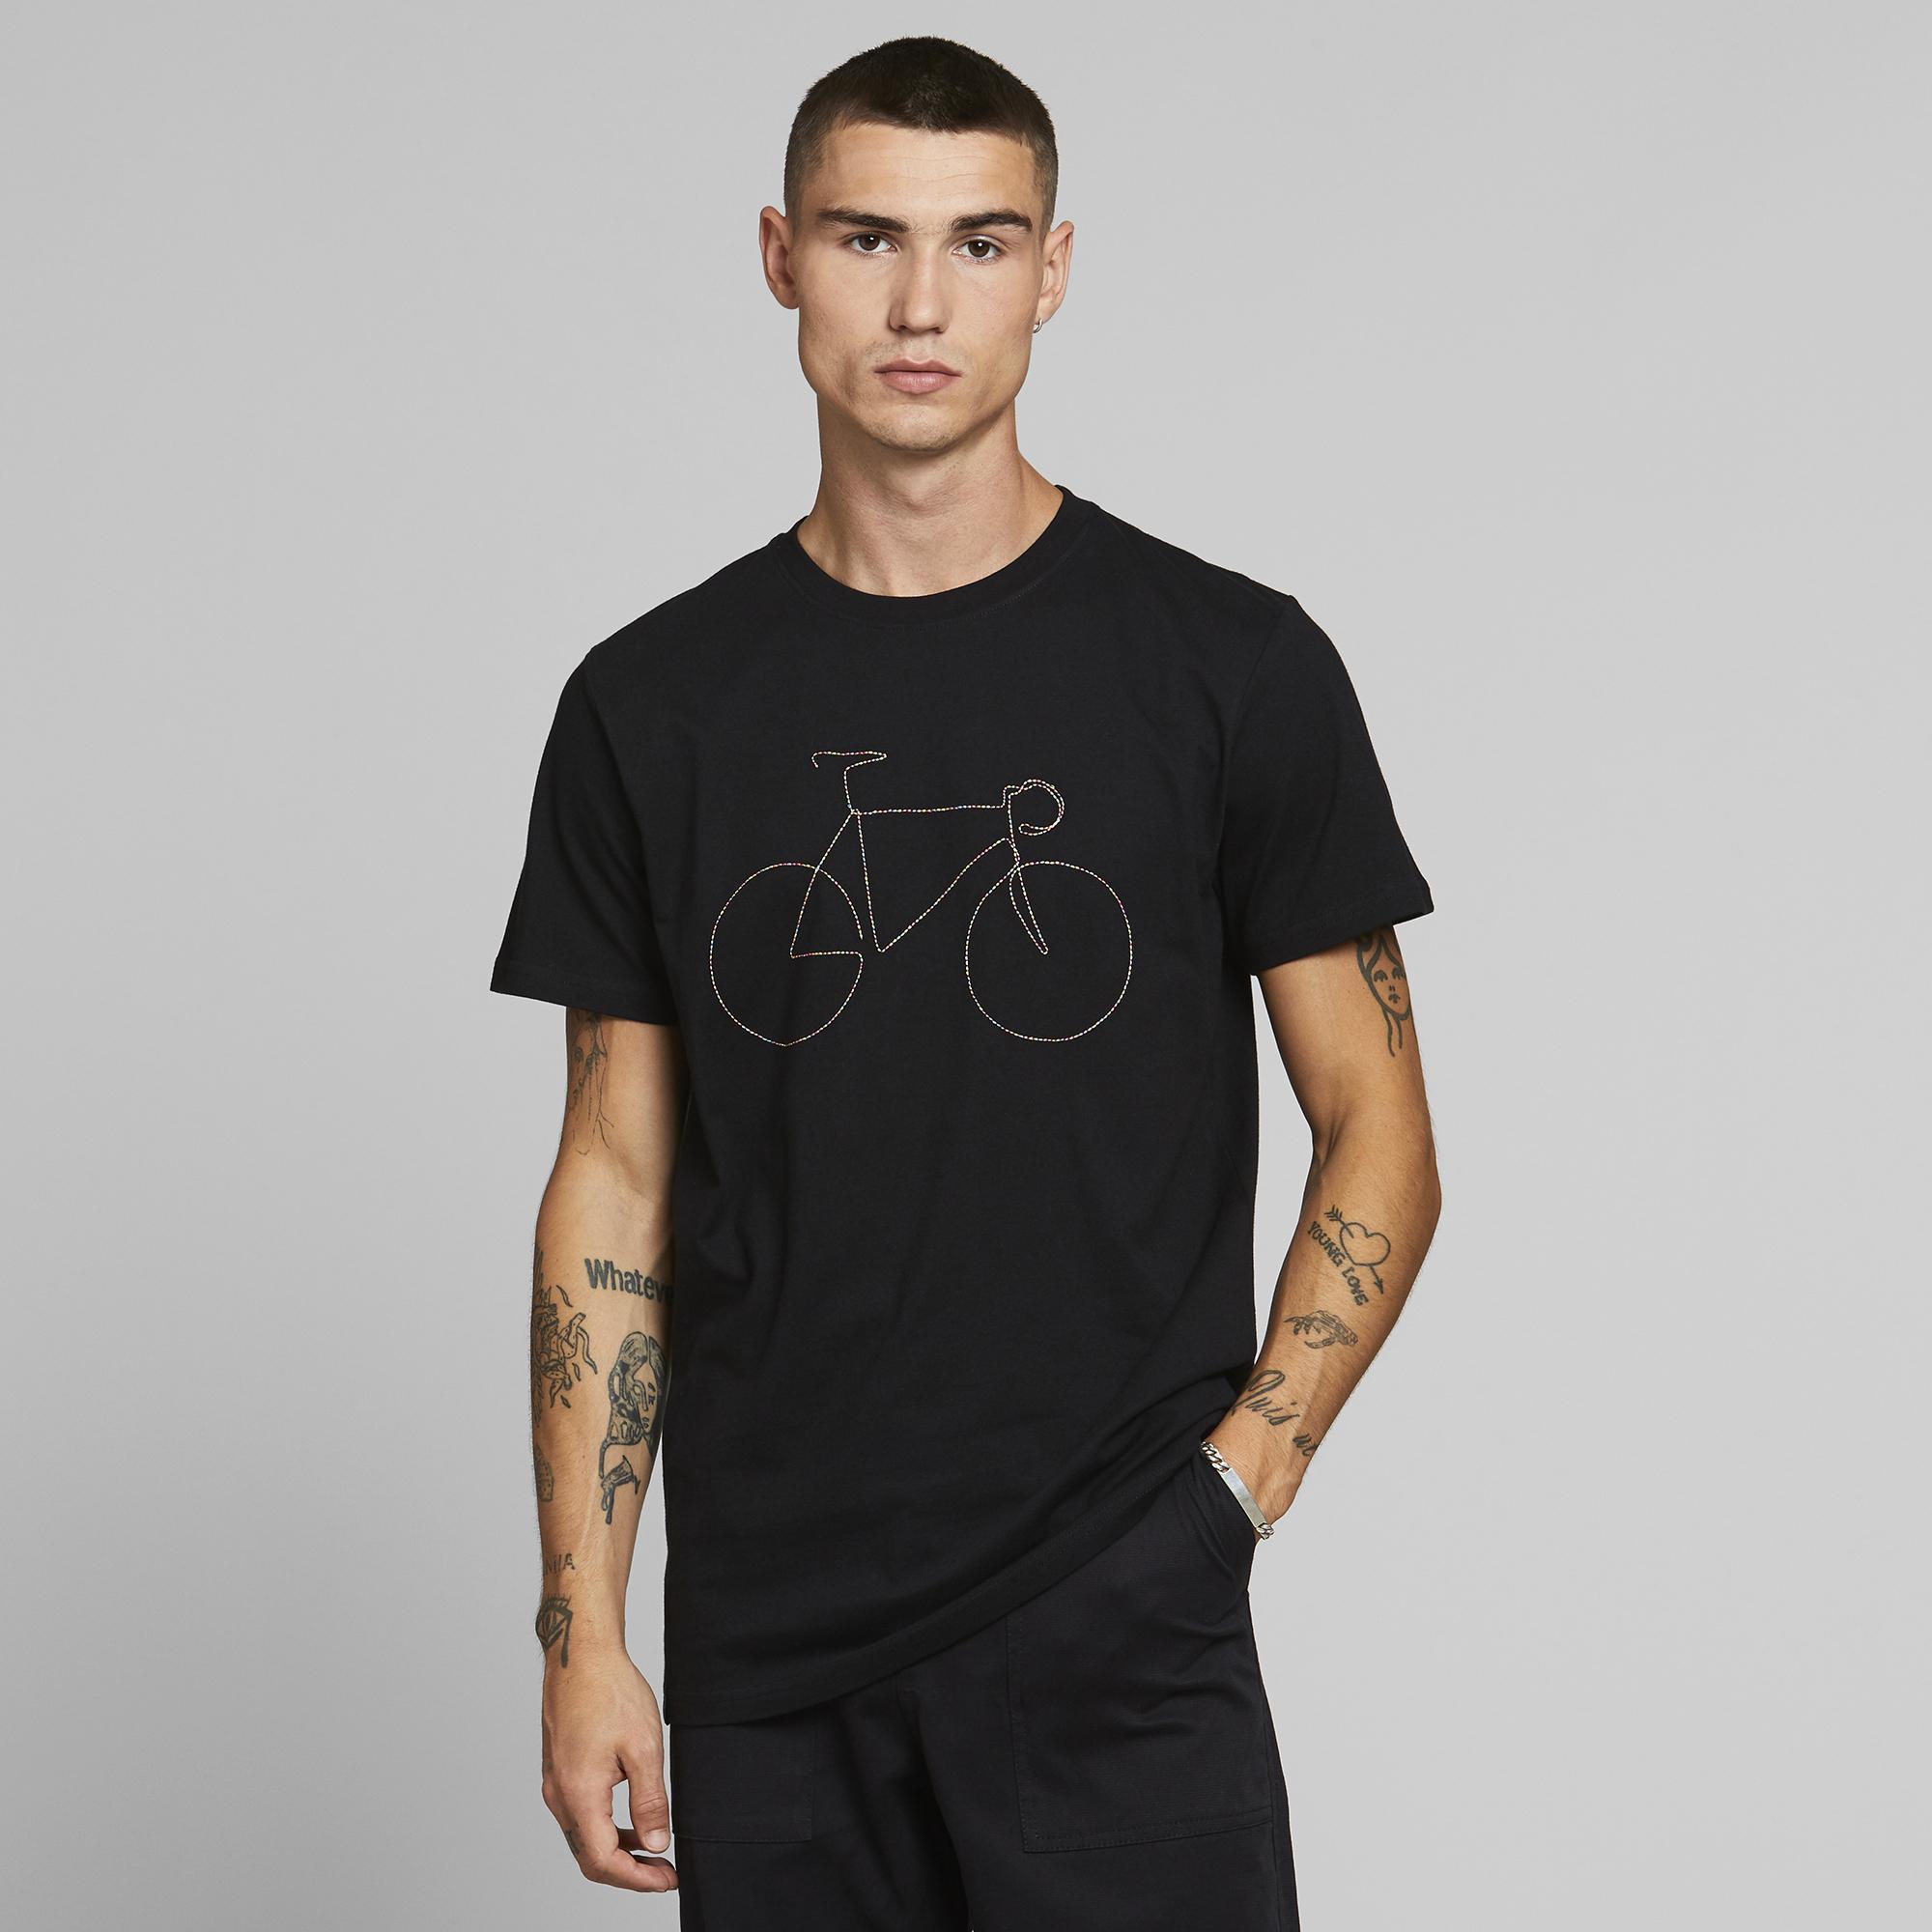 DEDICATED-STITCH-BIKE-Stockholm-Shirt-black1